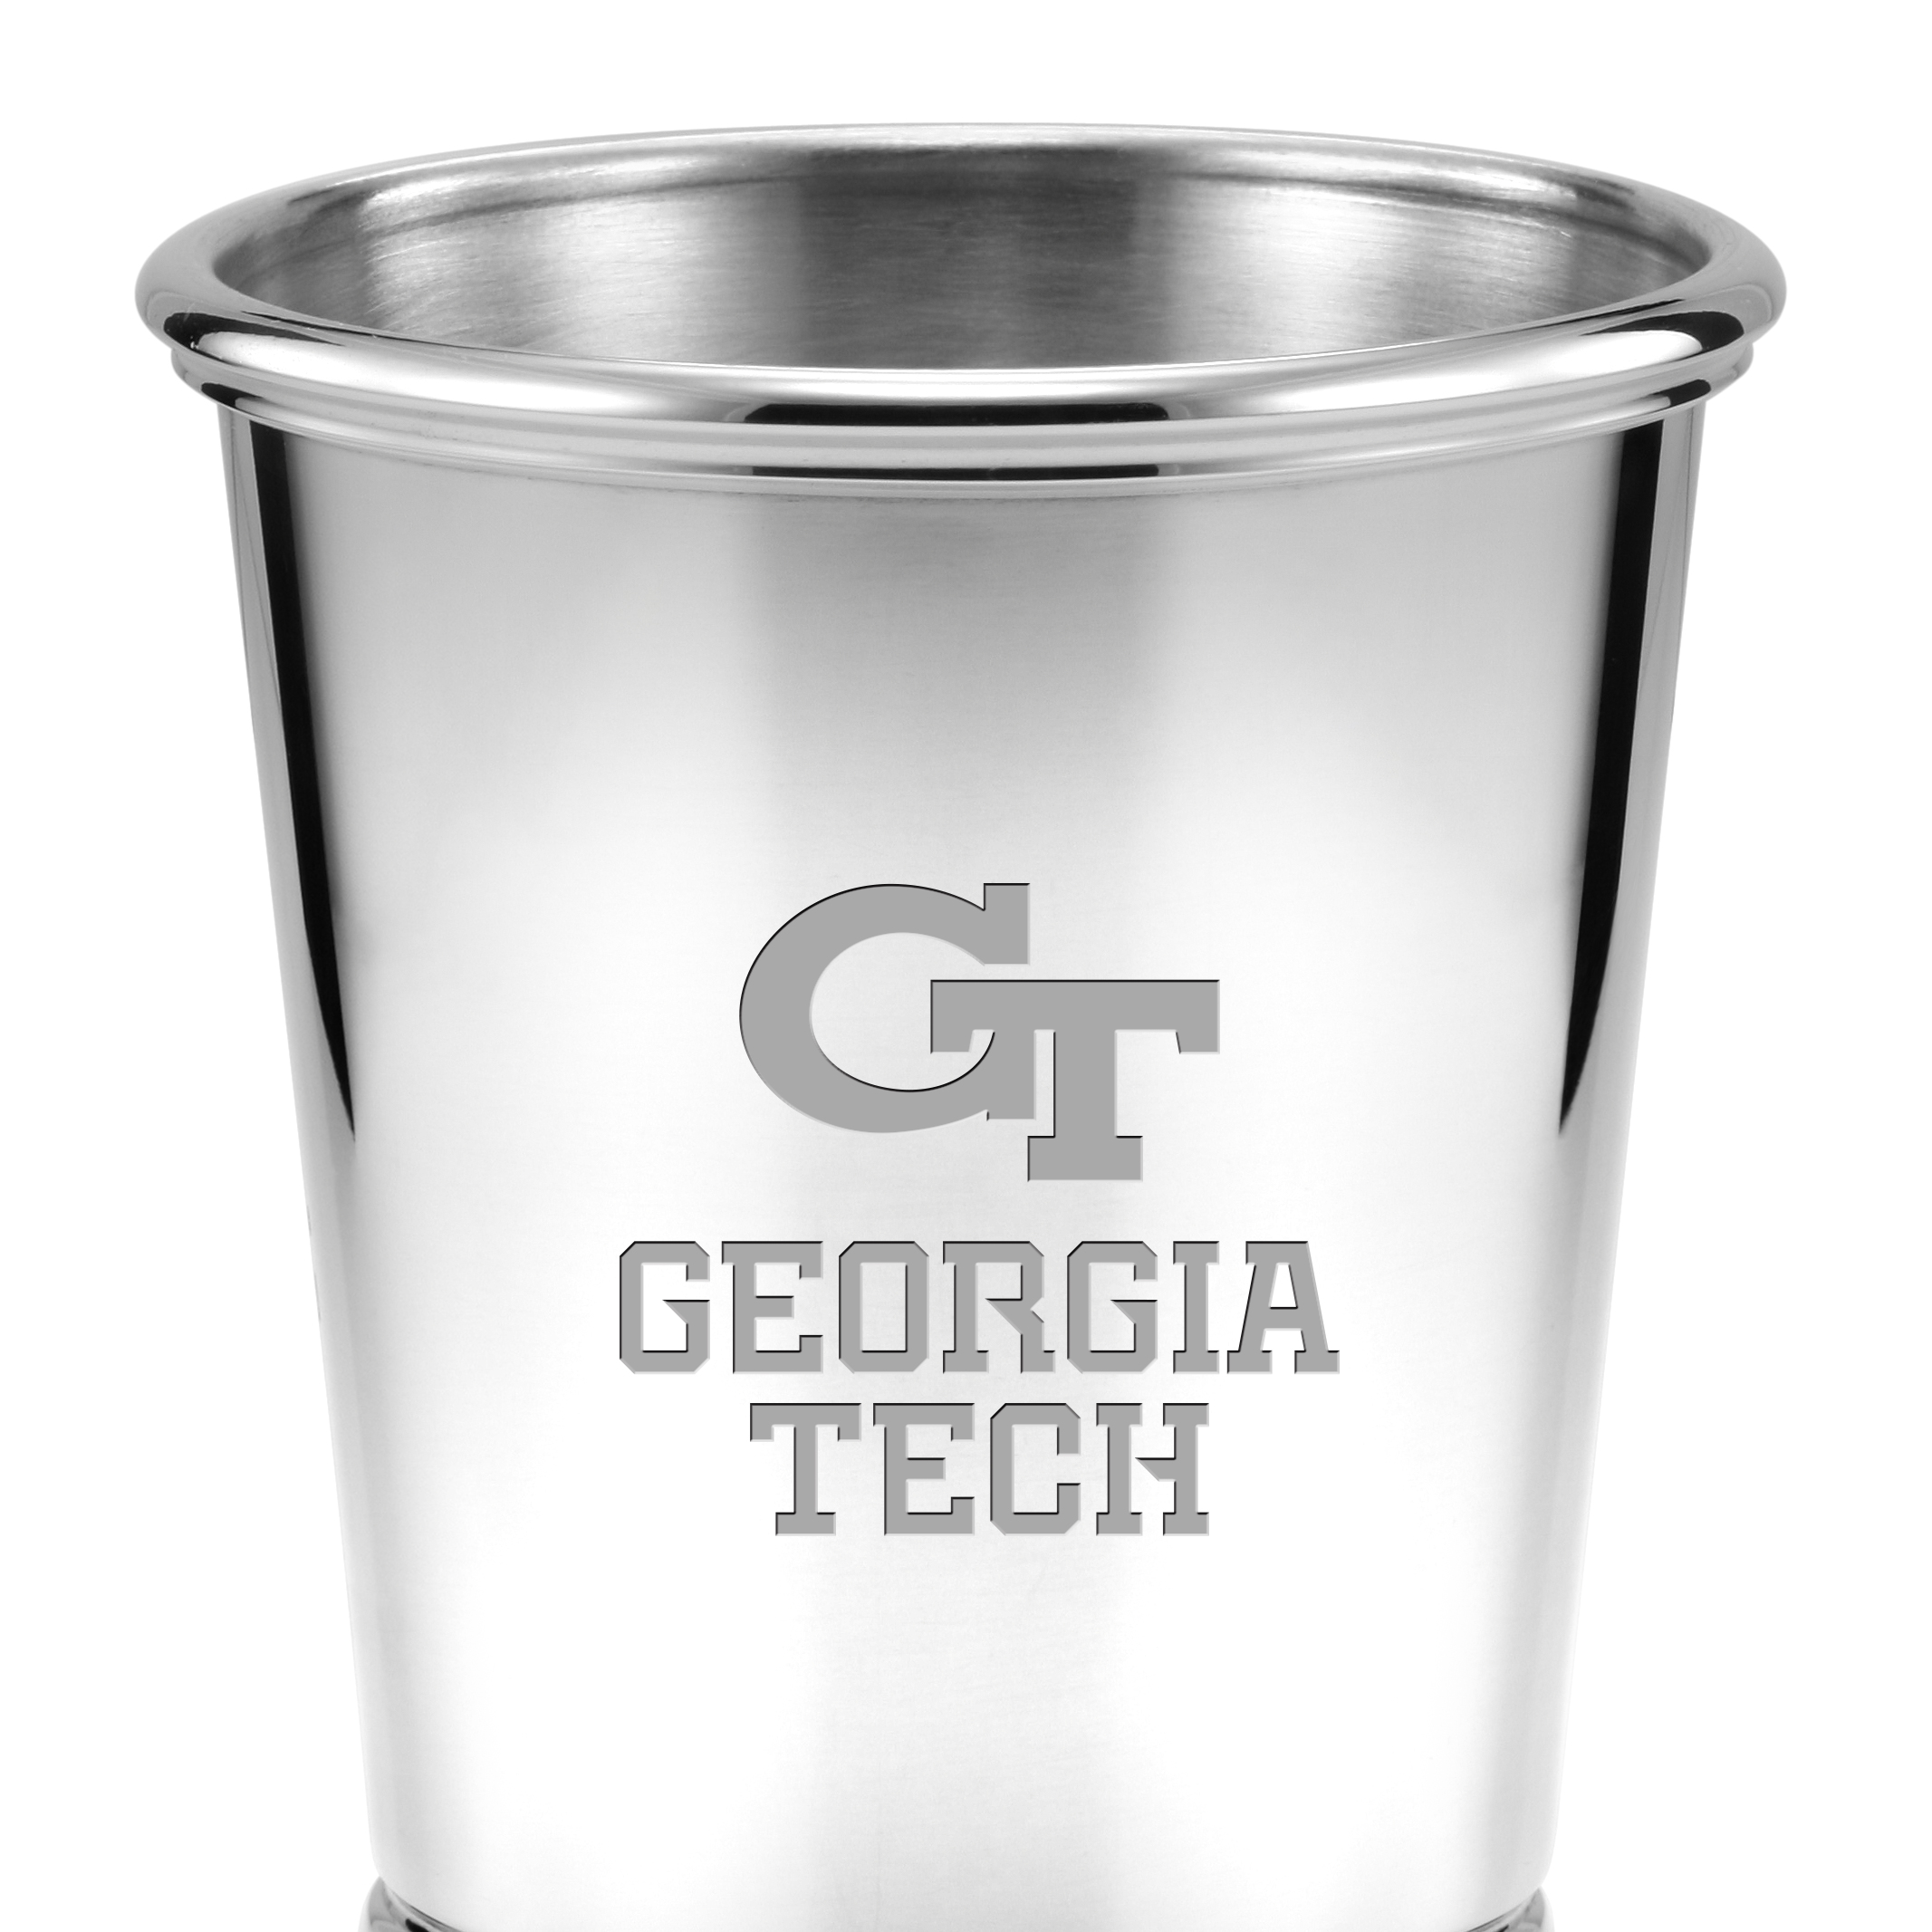 Georgia Tech Pewter Julep Cup - Image 2